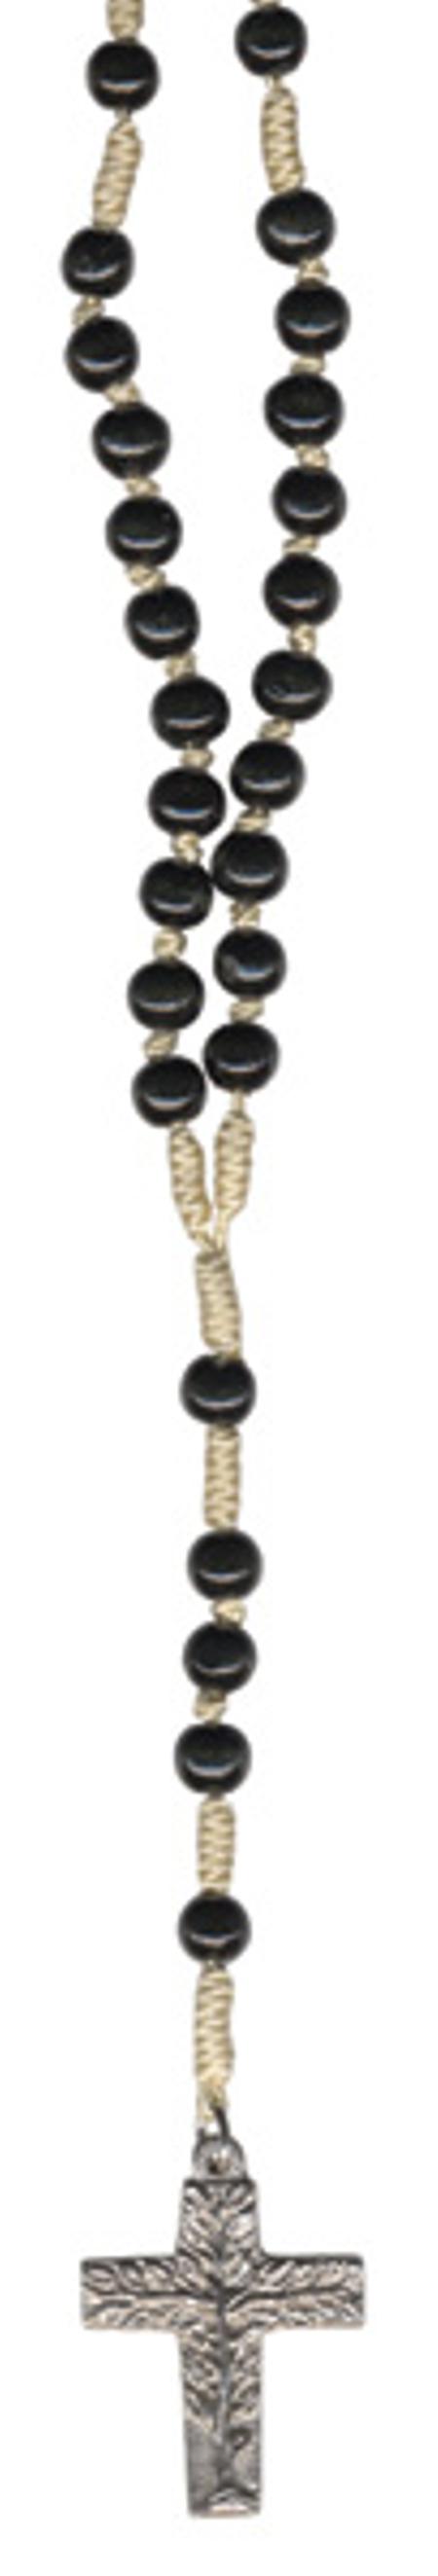 ROZENKRANS - grote parel - ZWART - levensboomkruis - 46 cm